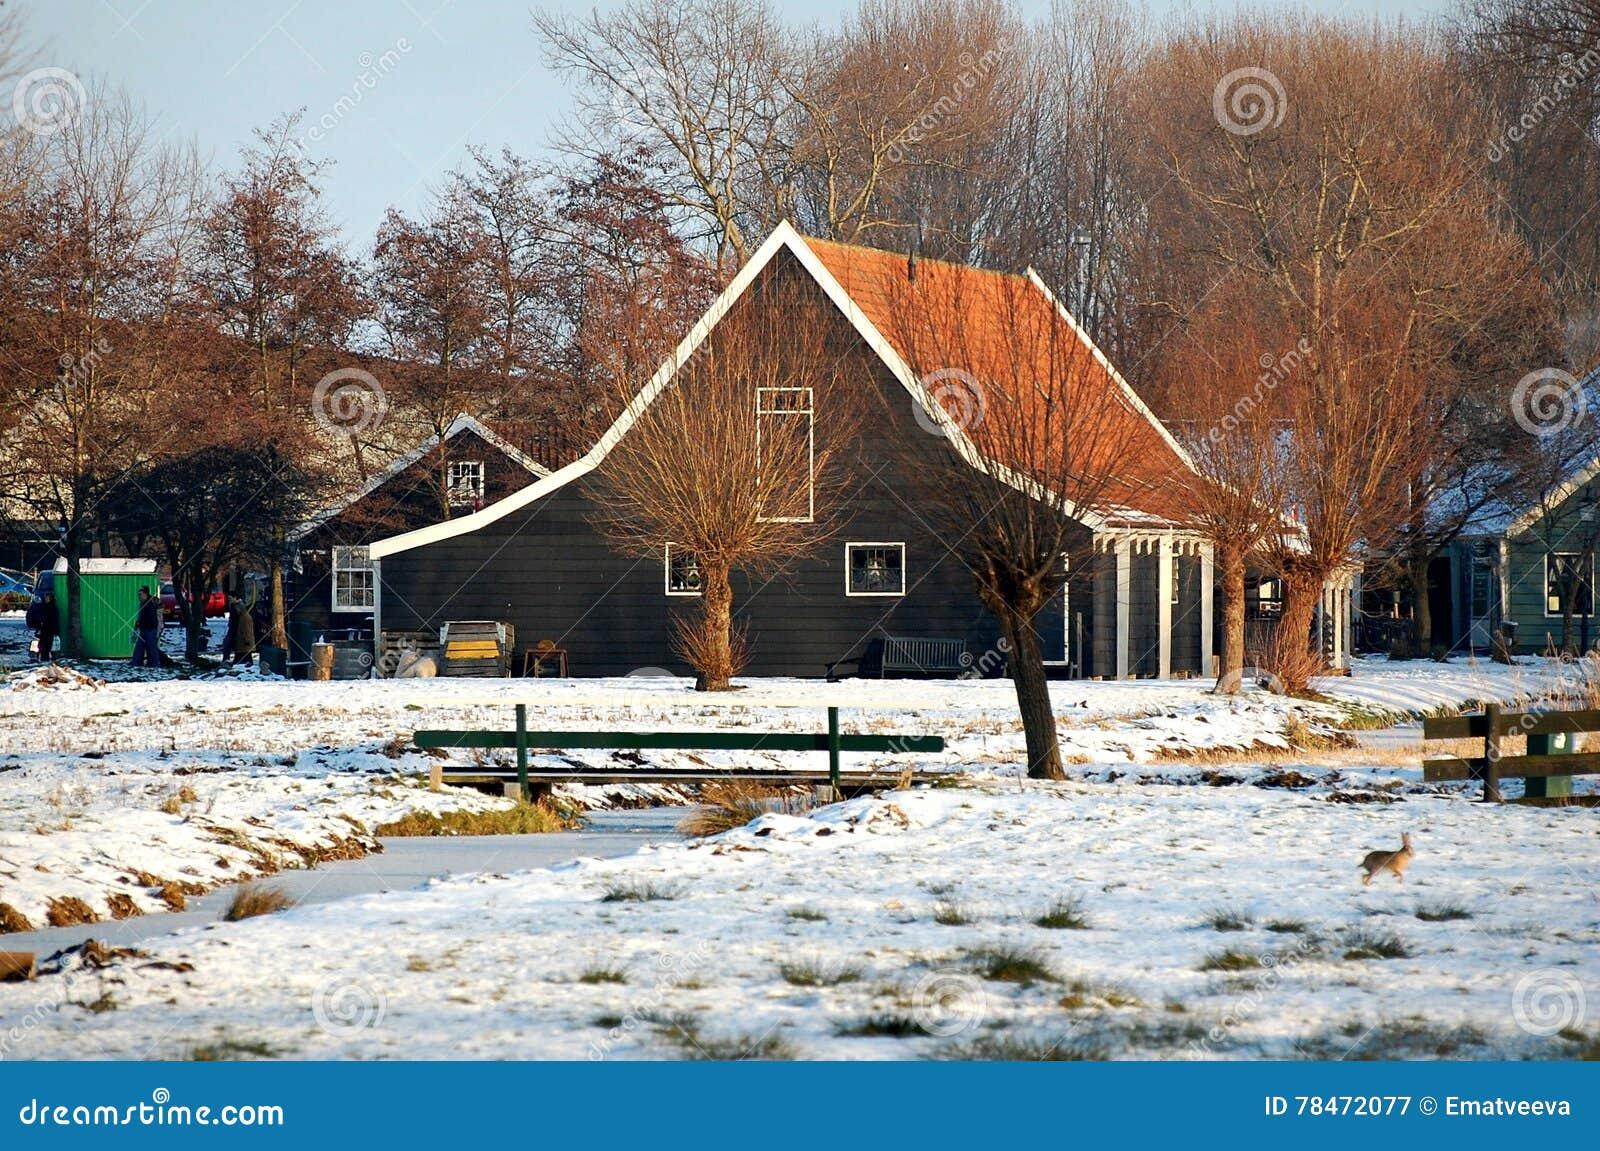 zaanse schans paesi bassi casa di campagna immagine stock immagine di freddo neve 78472077. Black Bedroom Furniture Sets. Home Design Ideas